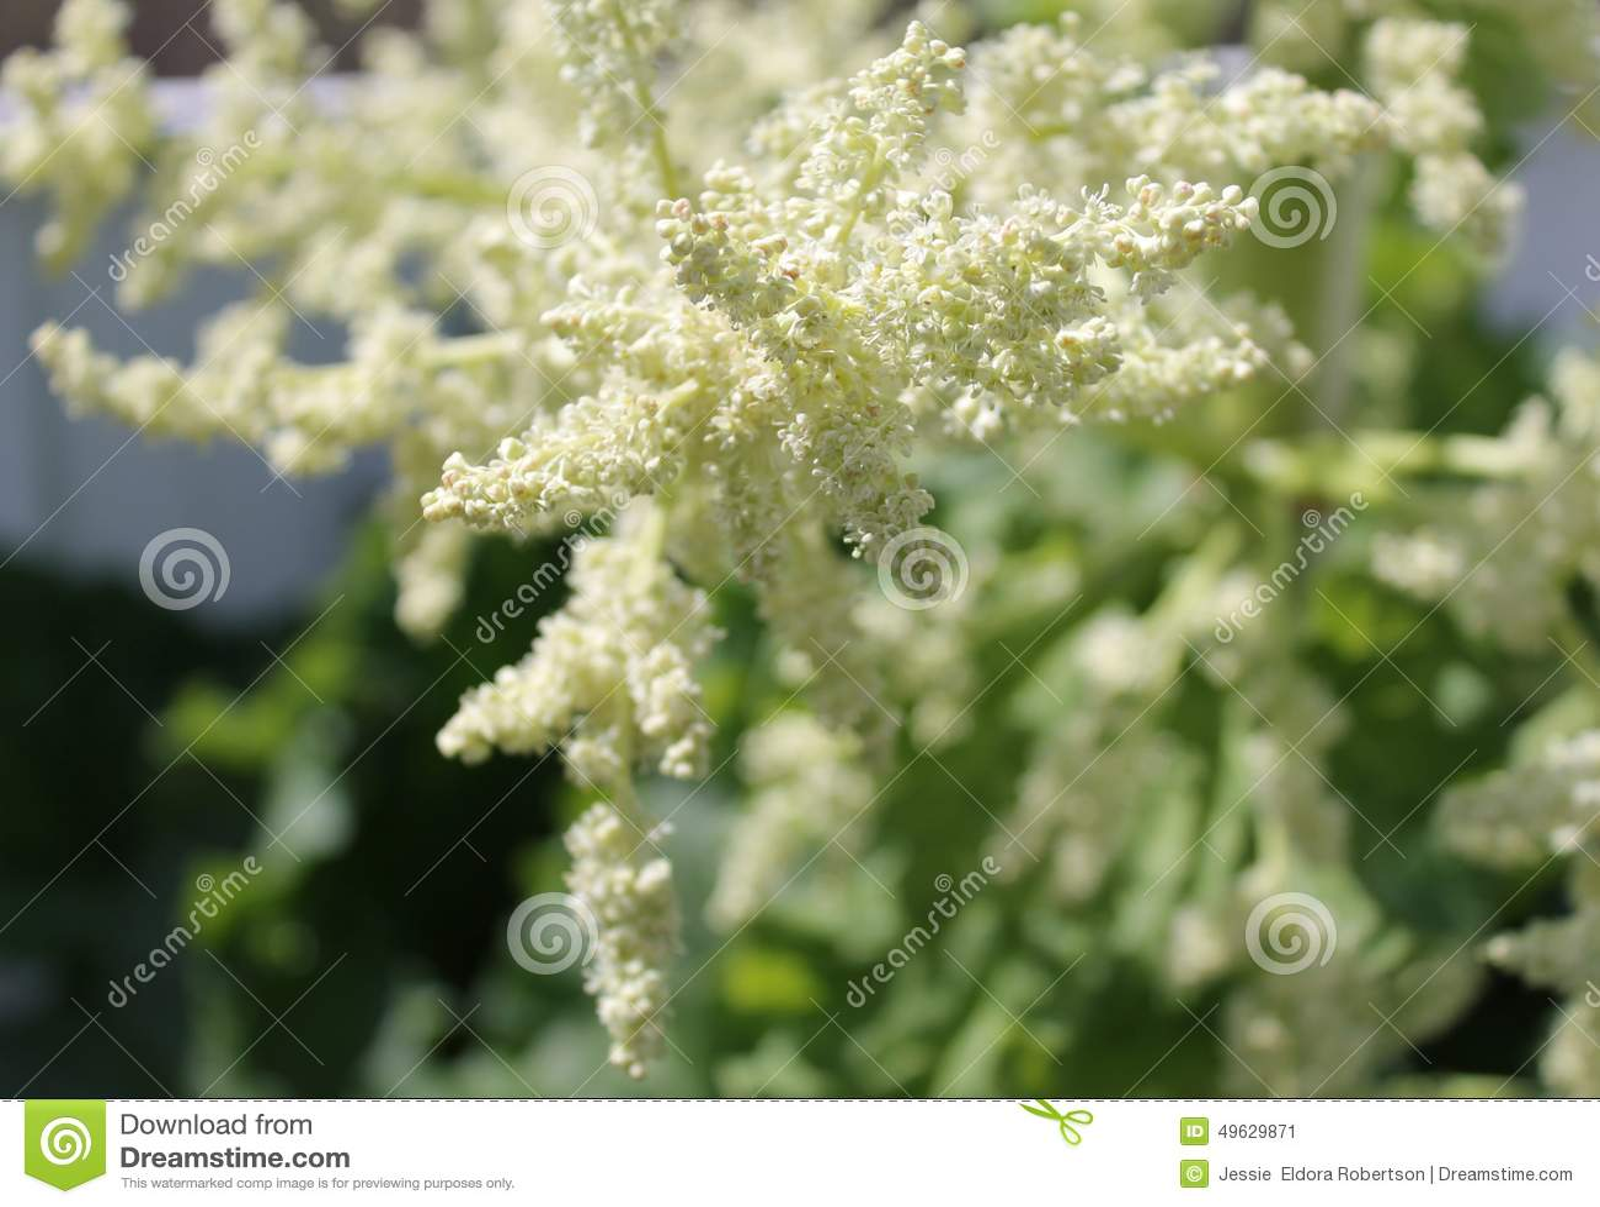 Fond de graine de rhubarbe photo stock image 49629871 - Graine de rhubarbe ...